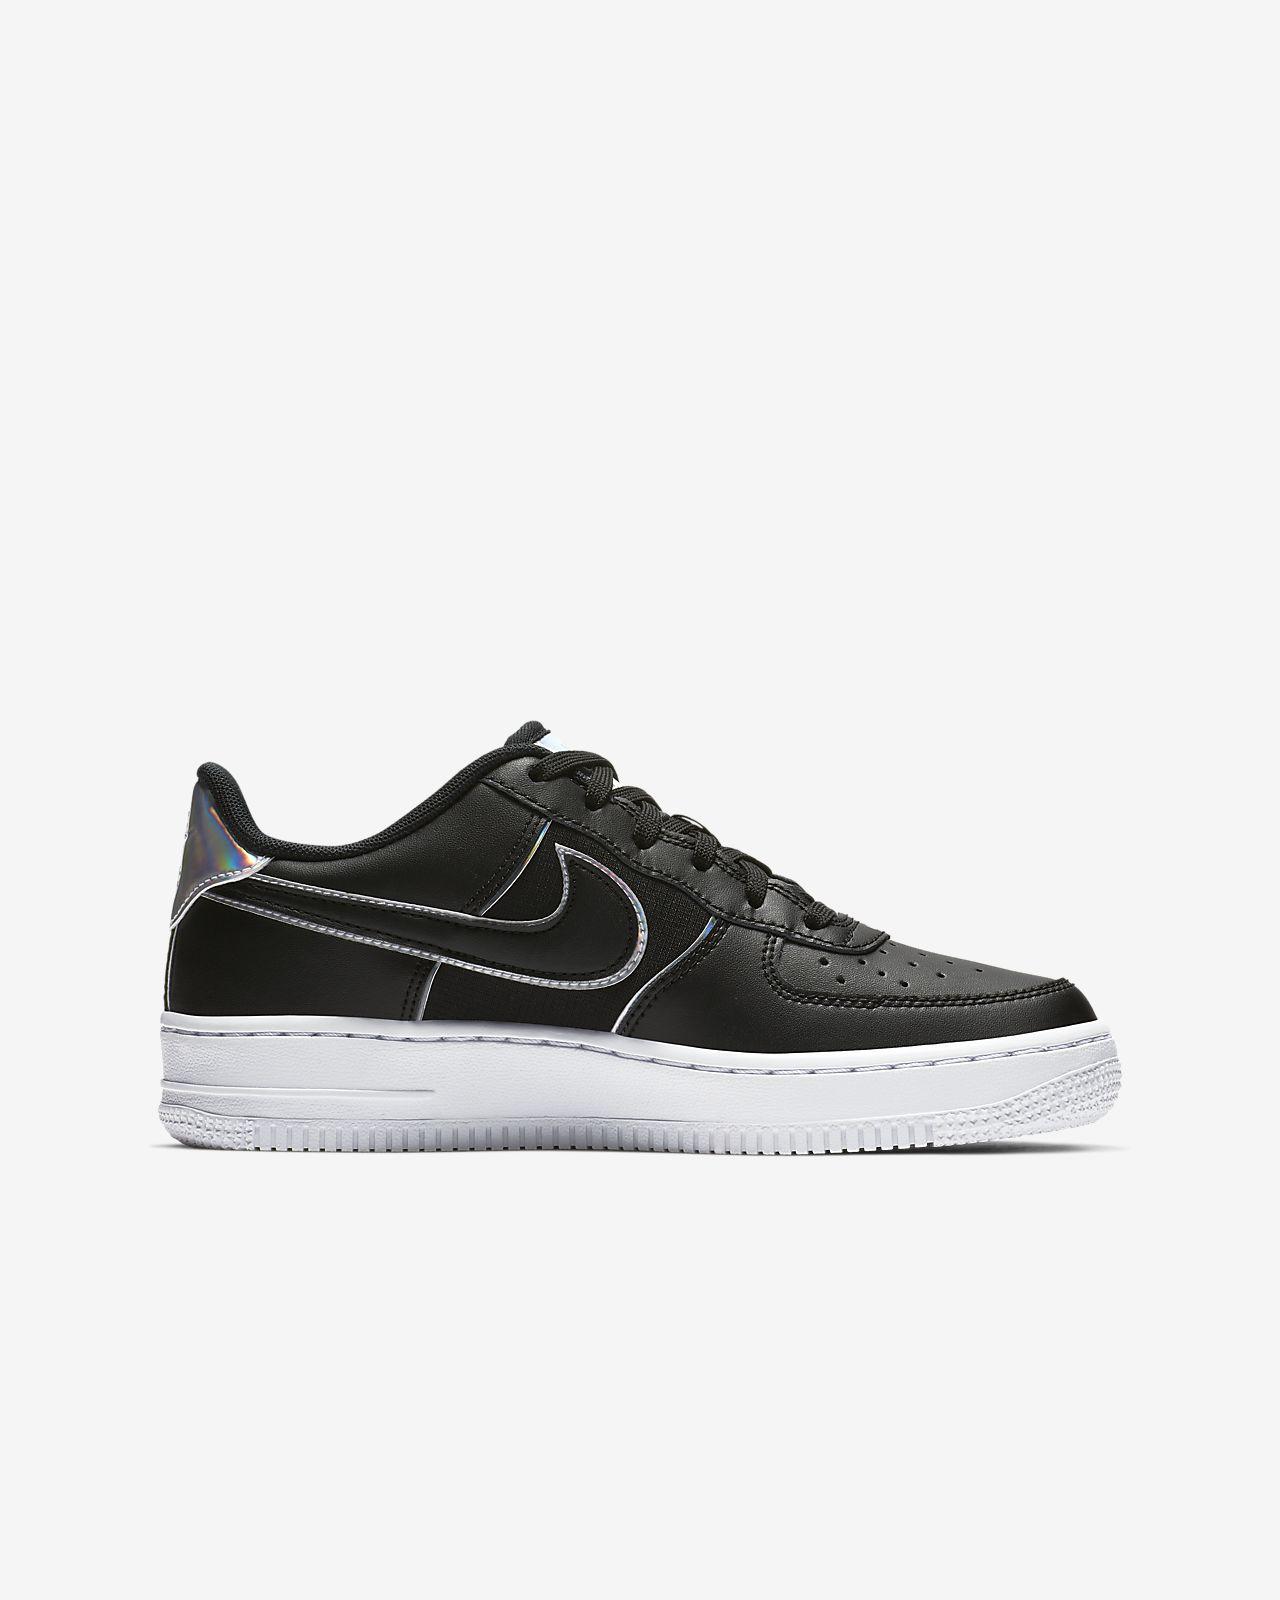 best service fe9eb e4e2c ... Nike Air Force 1 LV8 4 Big Kids  Shoe